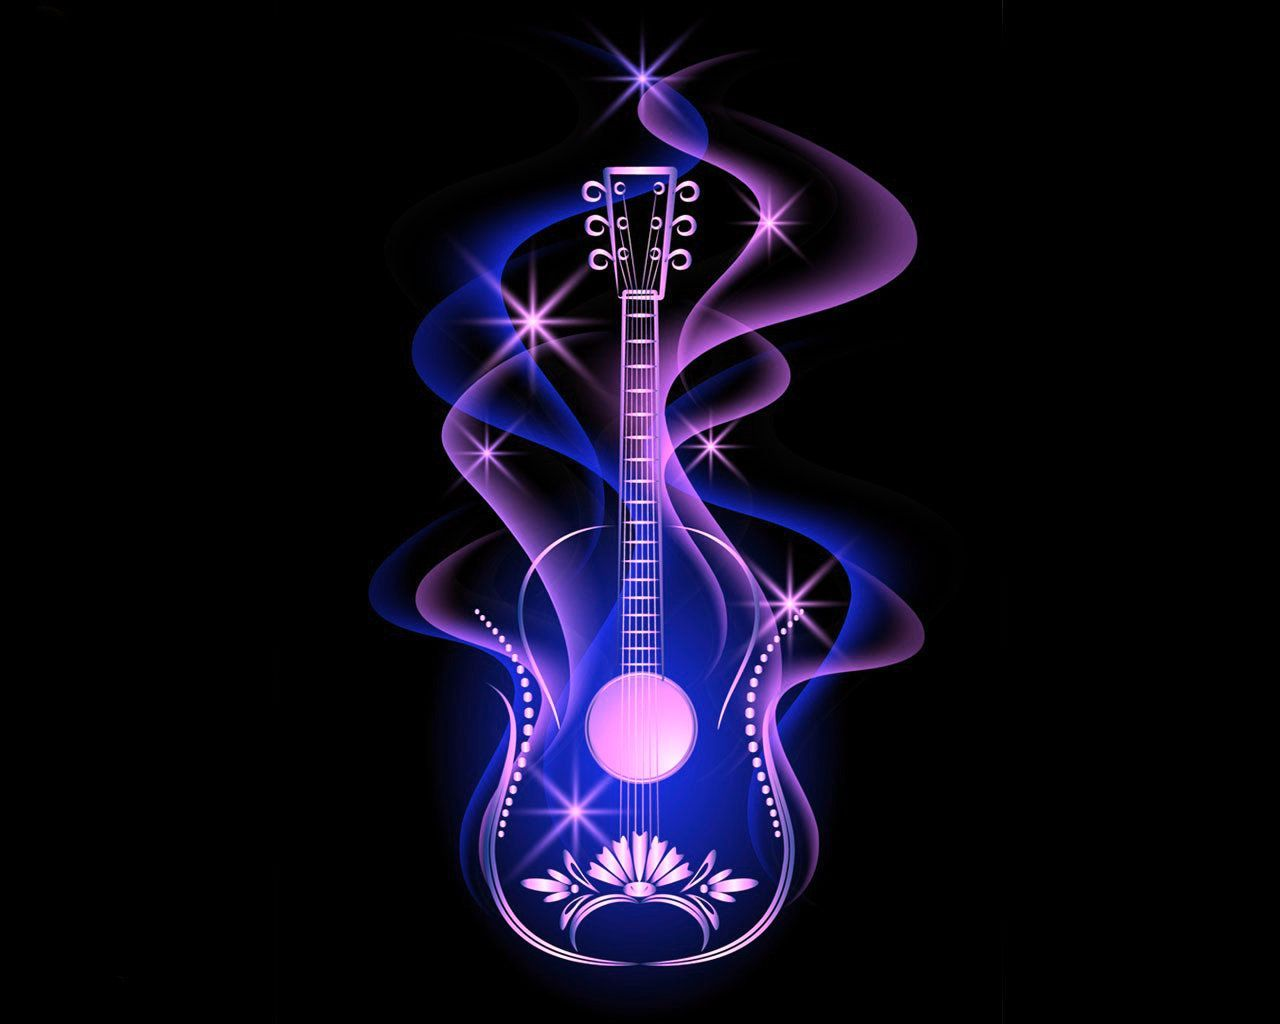 55 Colorful Guitar Wallpapers Download At Wallpaperbro Wallpaper Cool Guitar Guitar Wallpaper Iphone